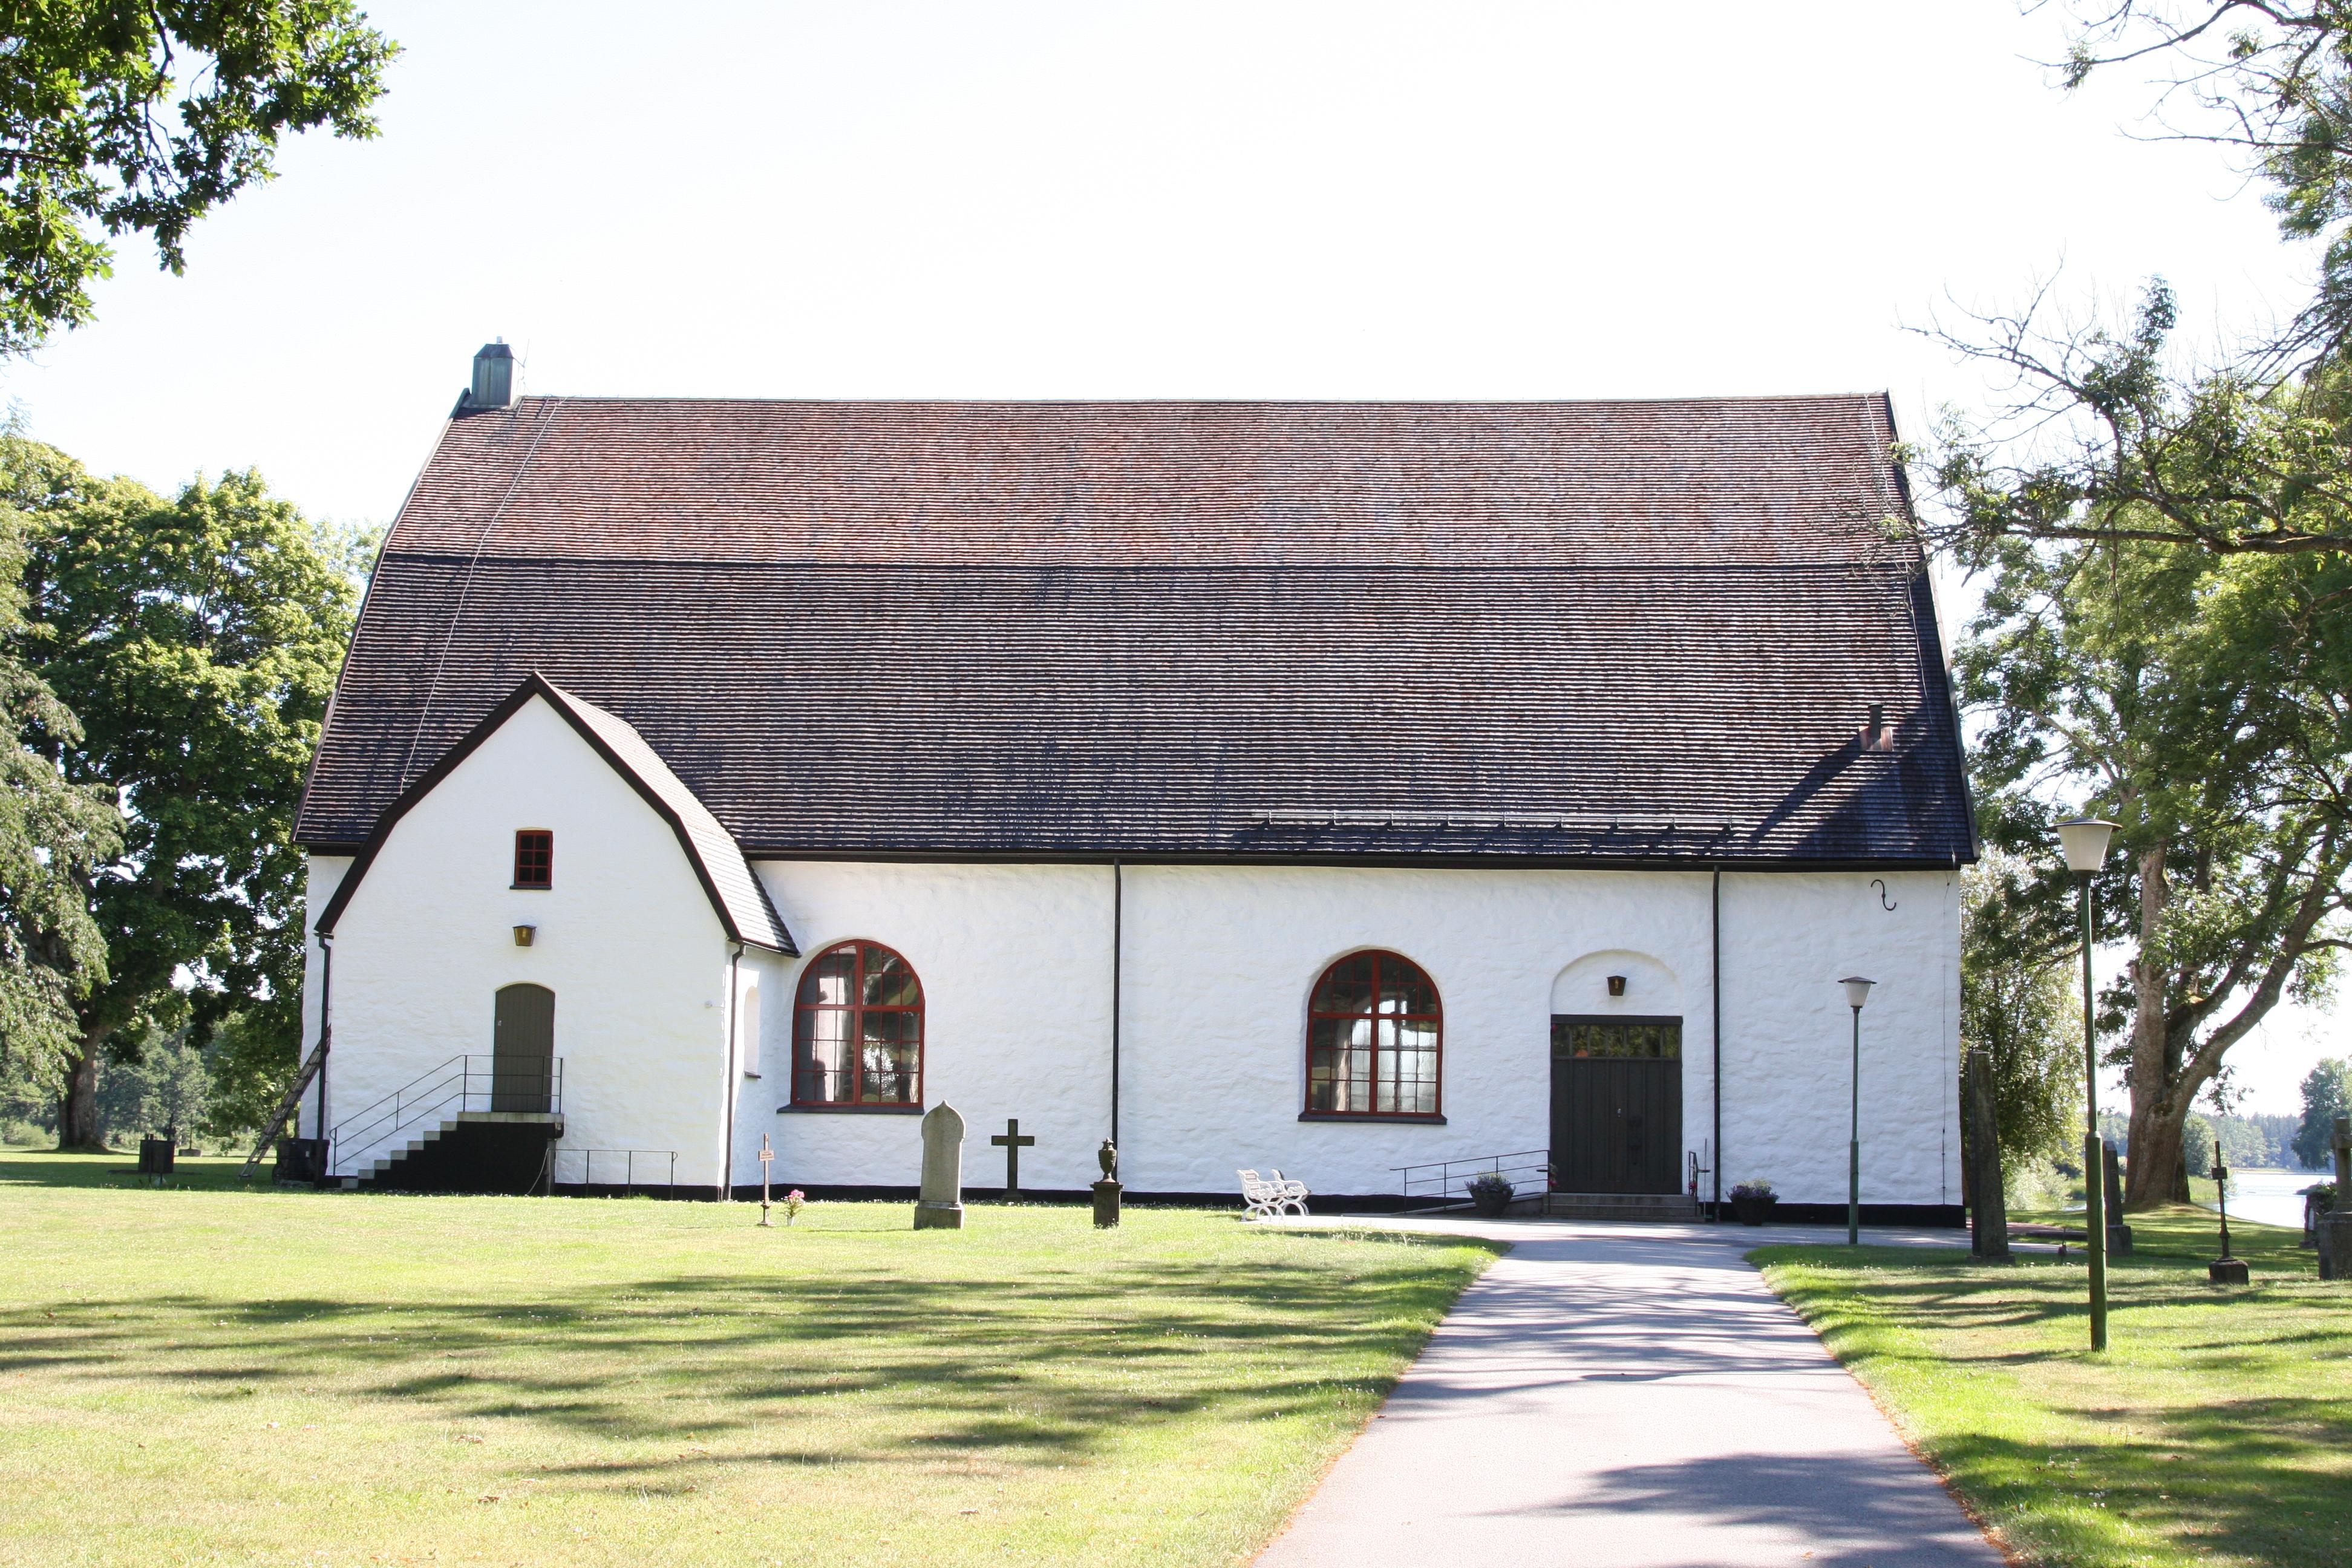 Lgenhet 2 rum/ kk nra golfbana i Vissefjrda - Airbnb